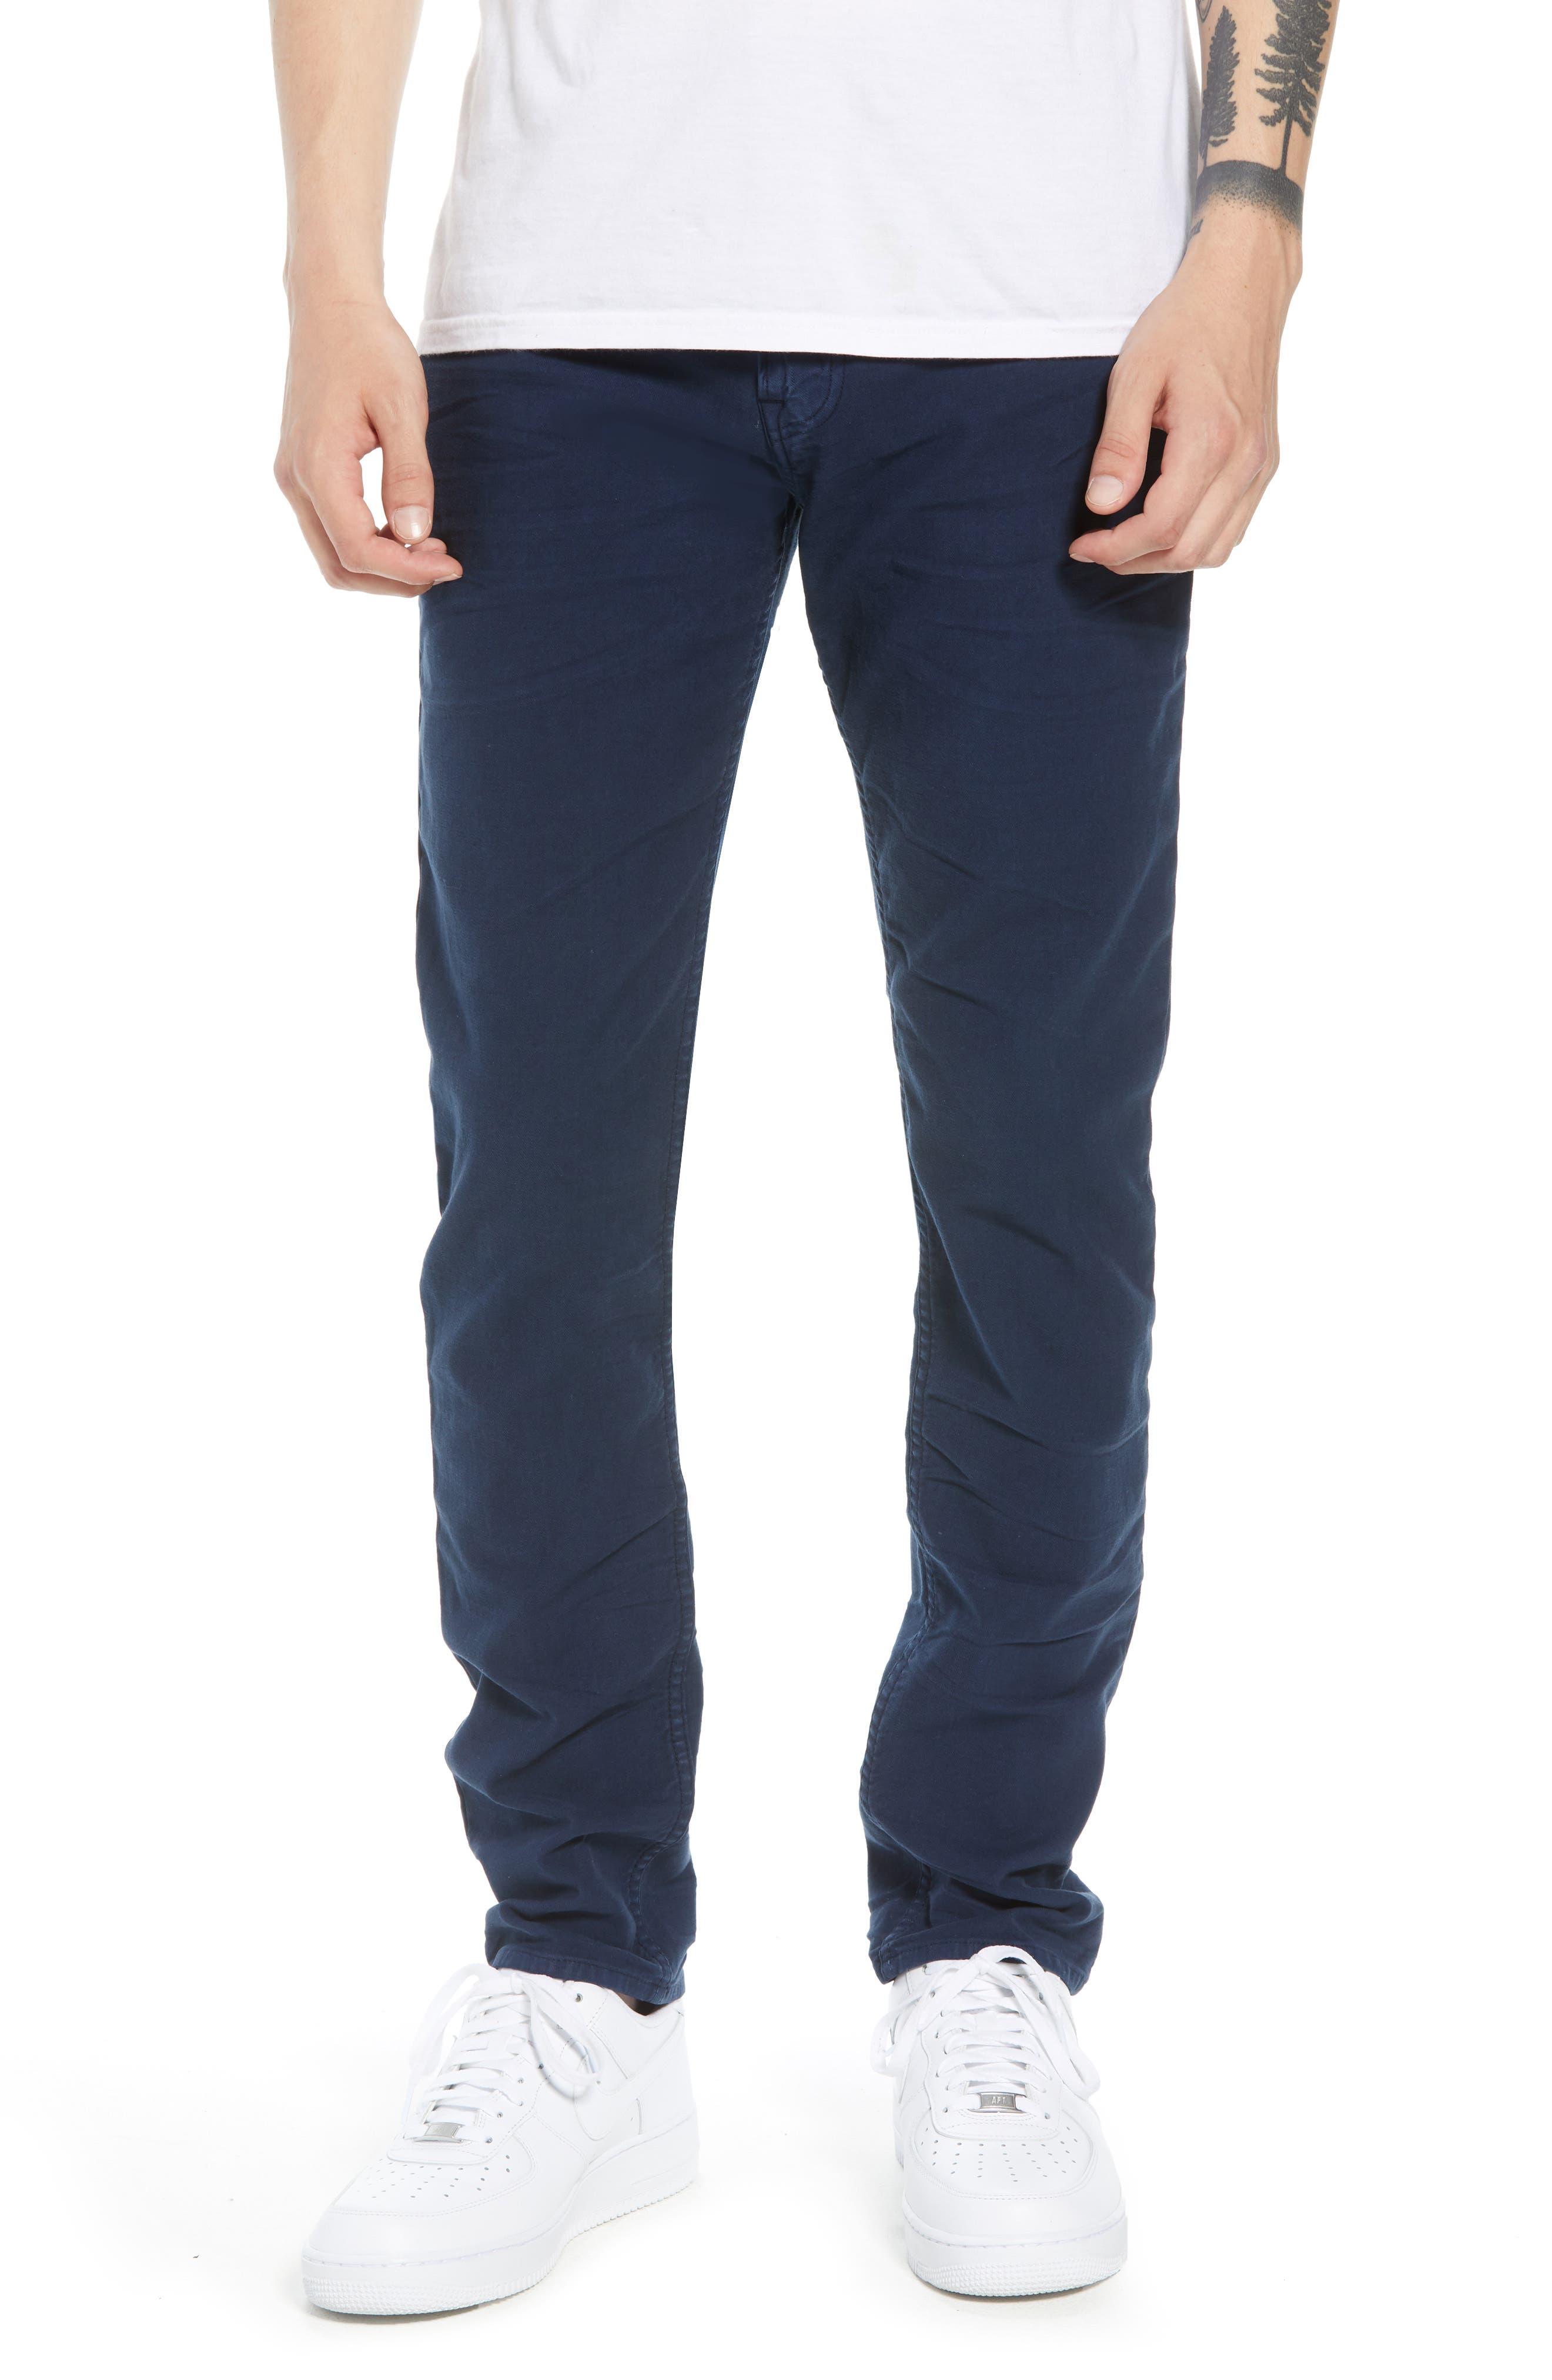 HUDSON JEANS, Axl Skinny Fit Jeans, Main thumbnail 1, color, SAILOR BLUE